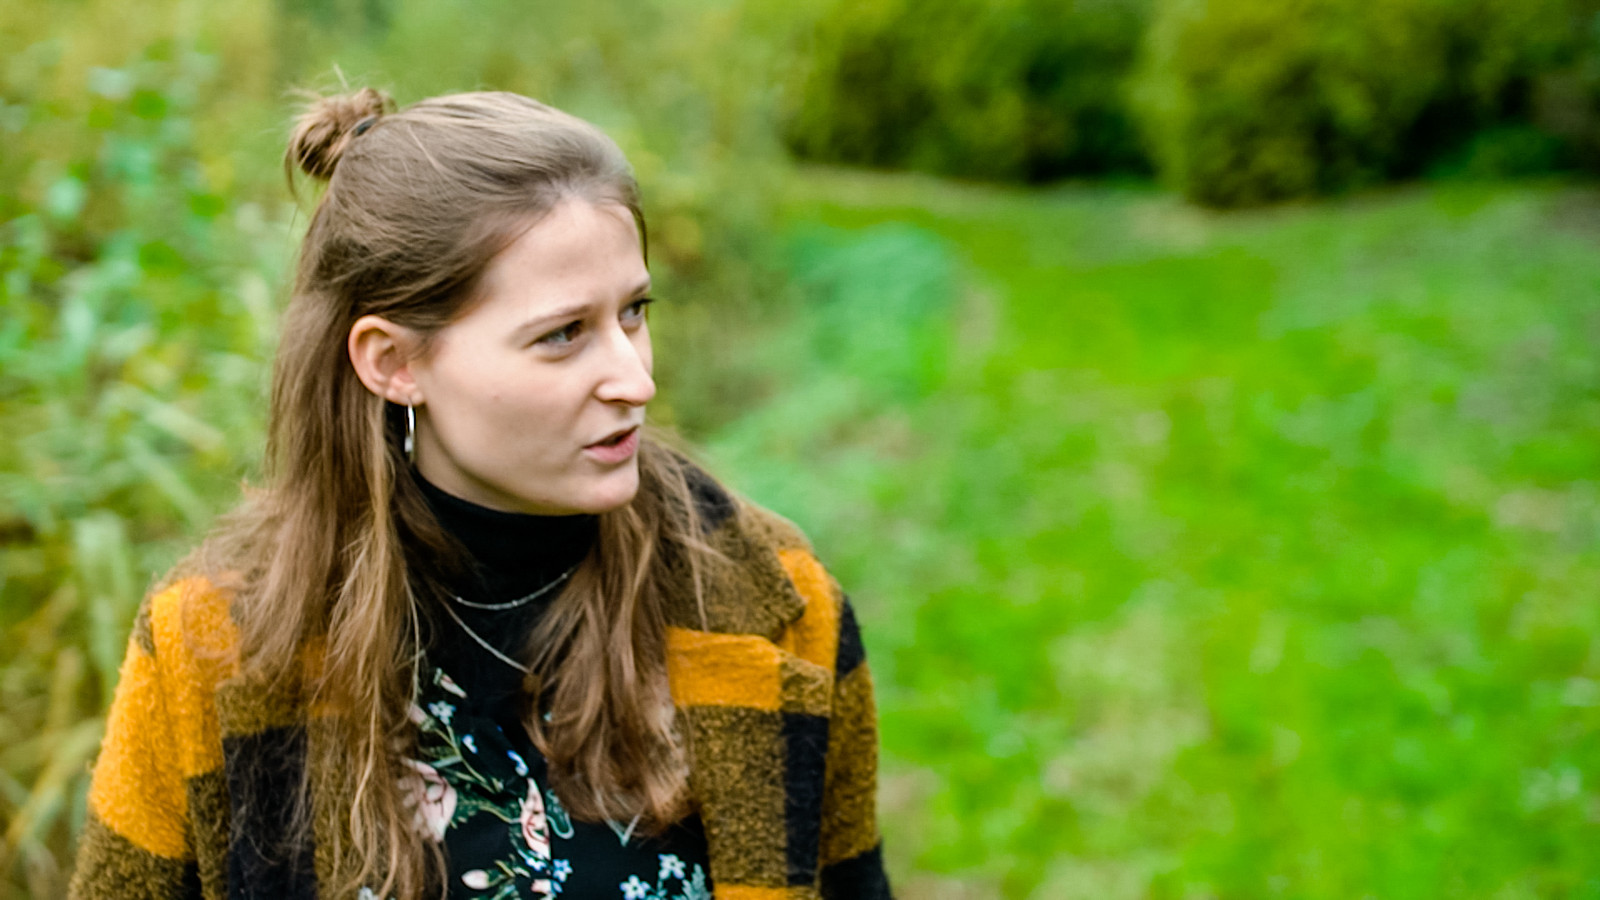 Jara Cabes uit Lier kreeg de kans om te videochatten met Koning Filip.